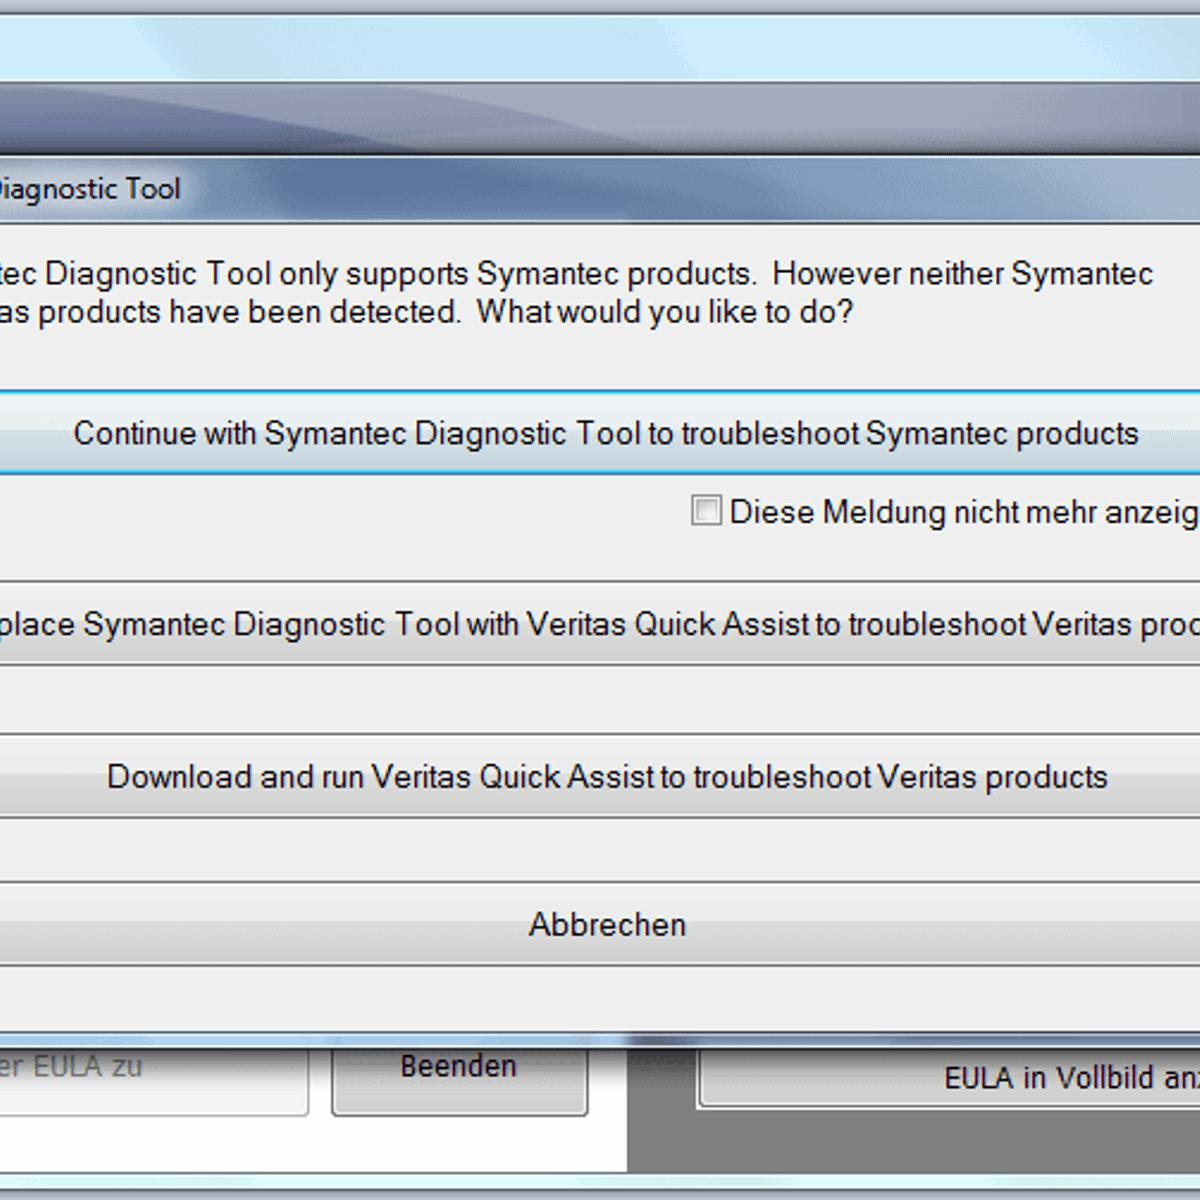 Symantec Diagnostic Tool Alternatives and Similar Software